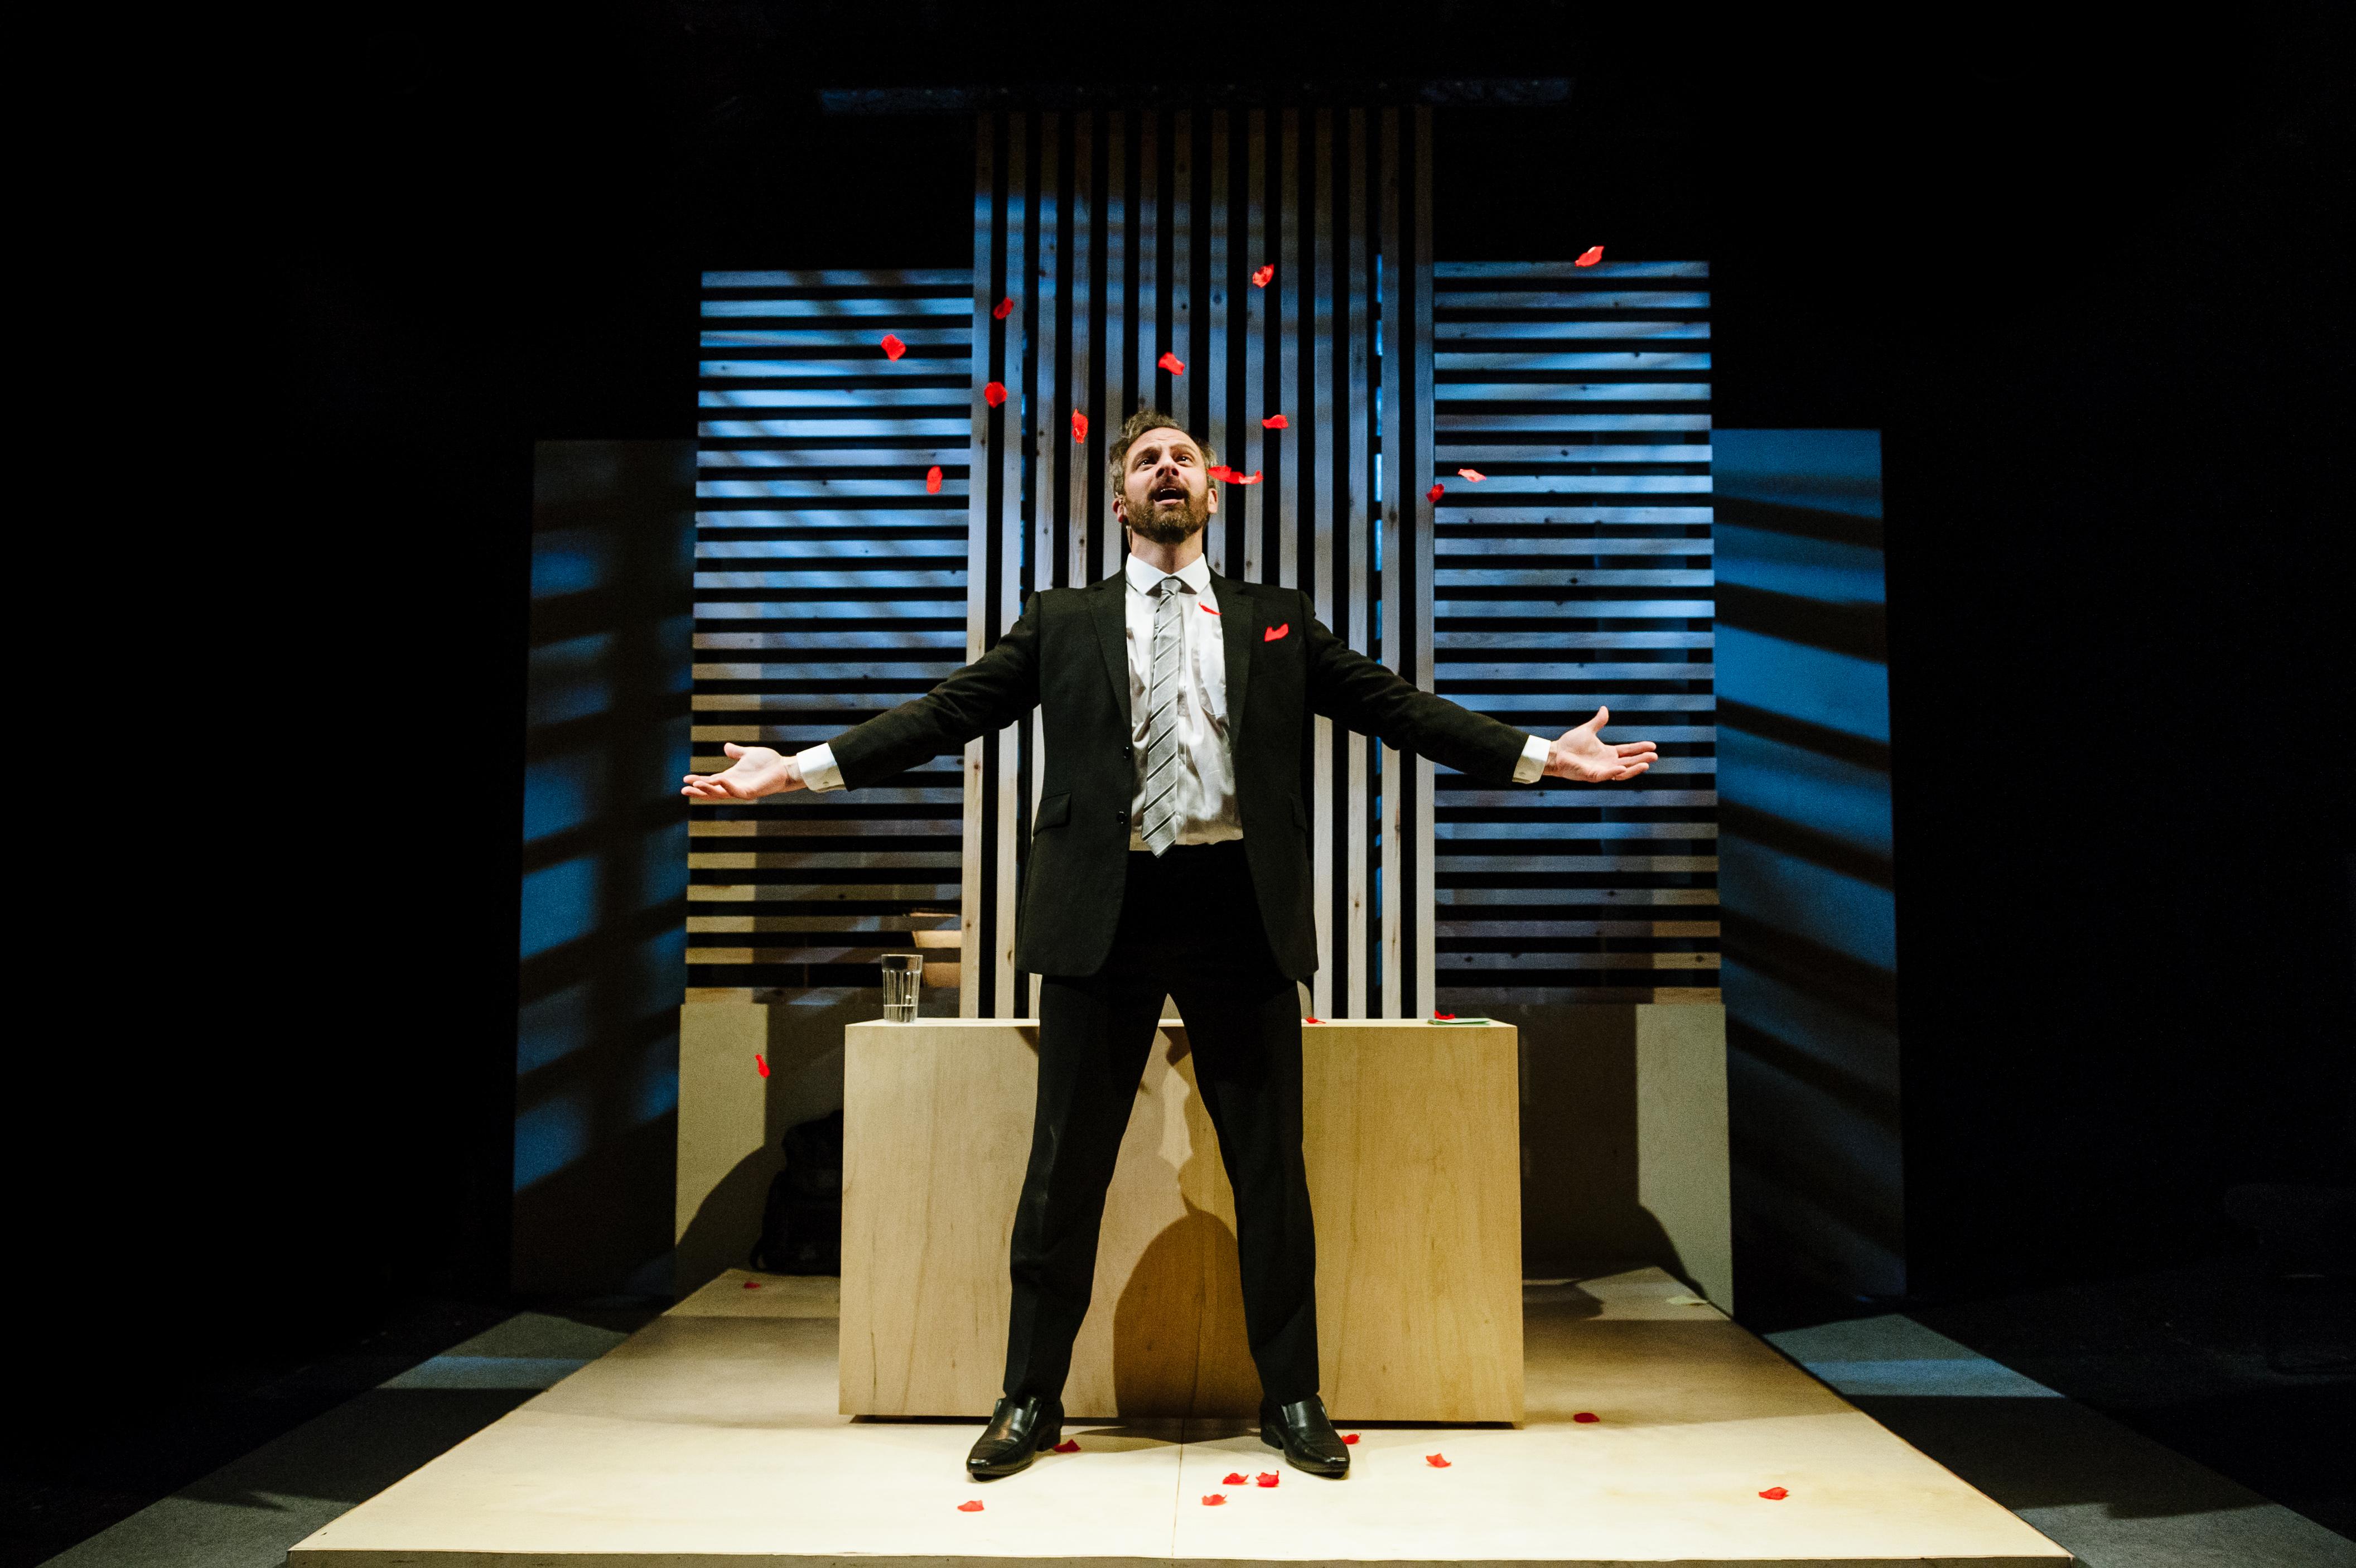 BWW Review: SUPERHERO, Southwark Playhouse